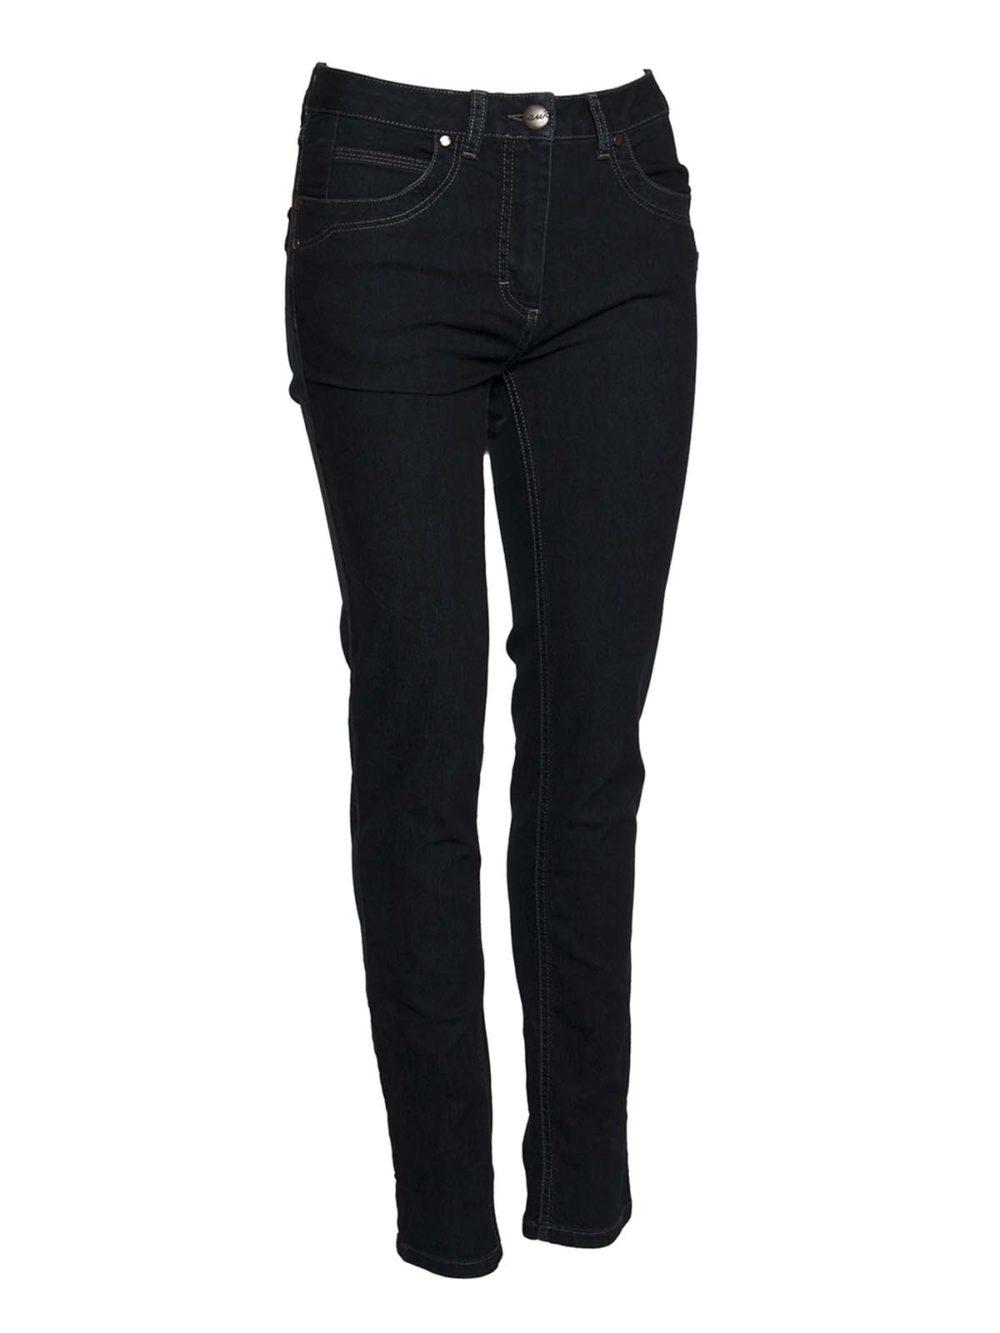 Laura Slim Trousers Laurie Katie Kerr Women's clothing